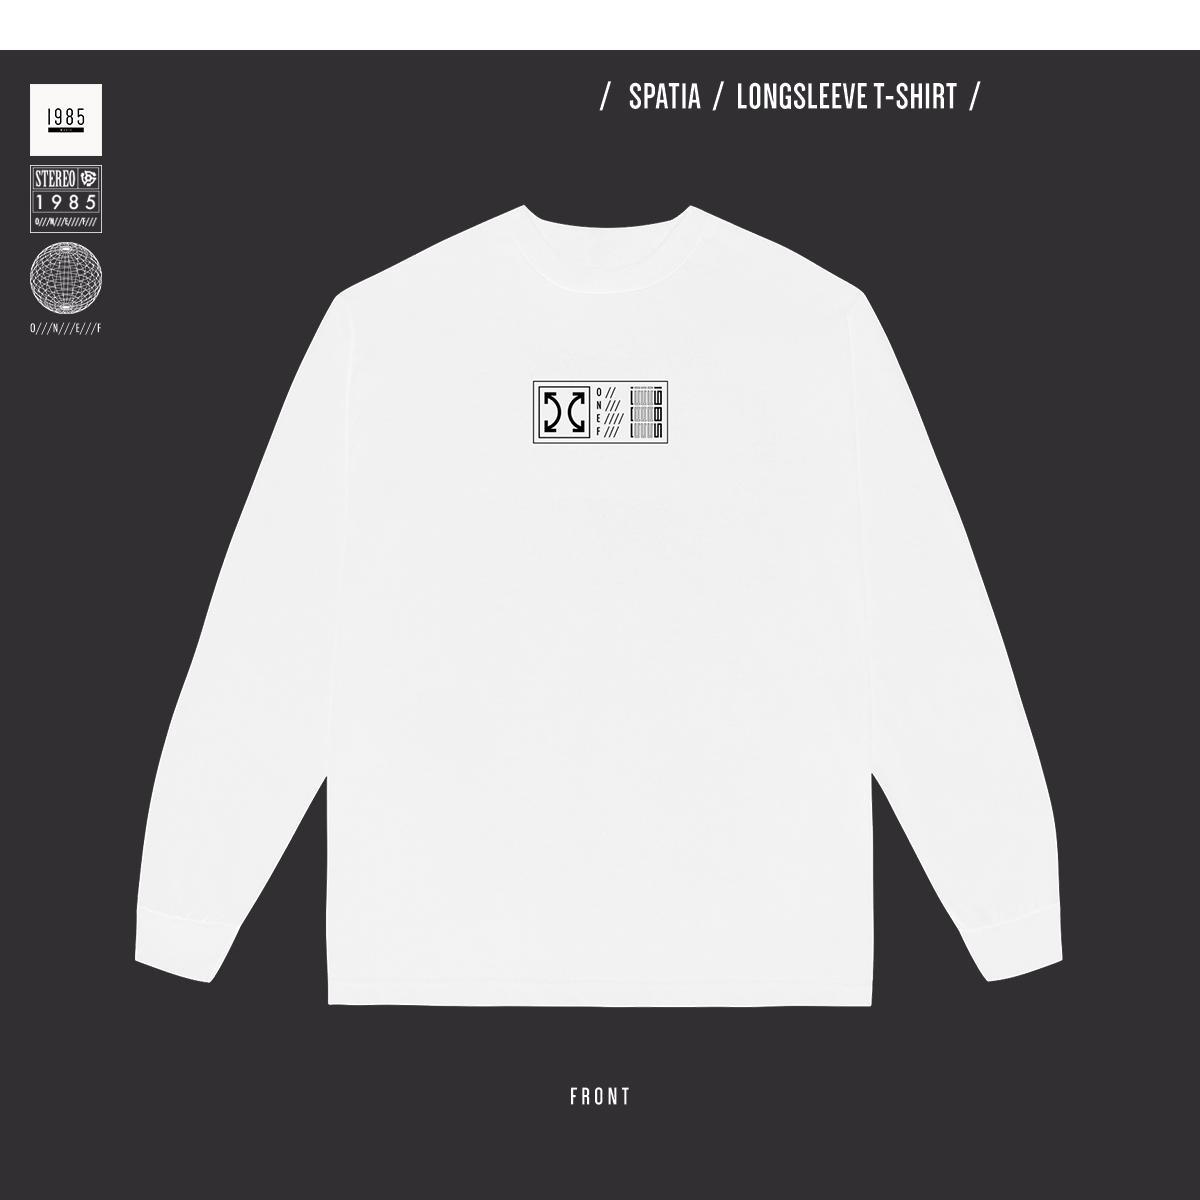 Spatia - Longsleeve T-shirt - White